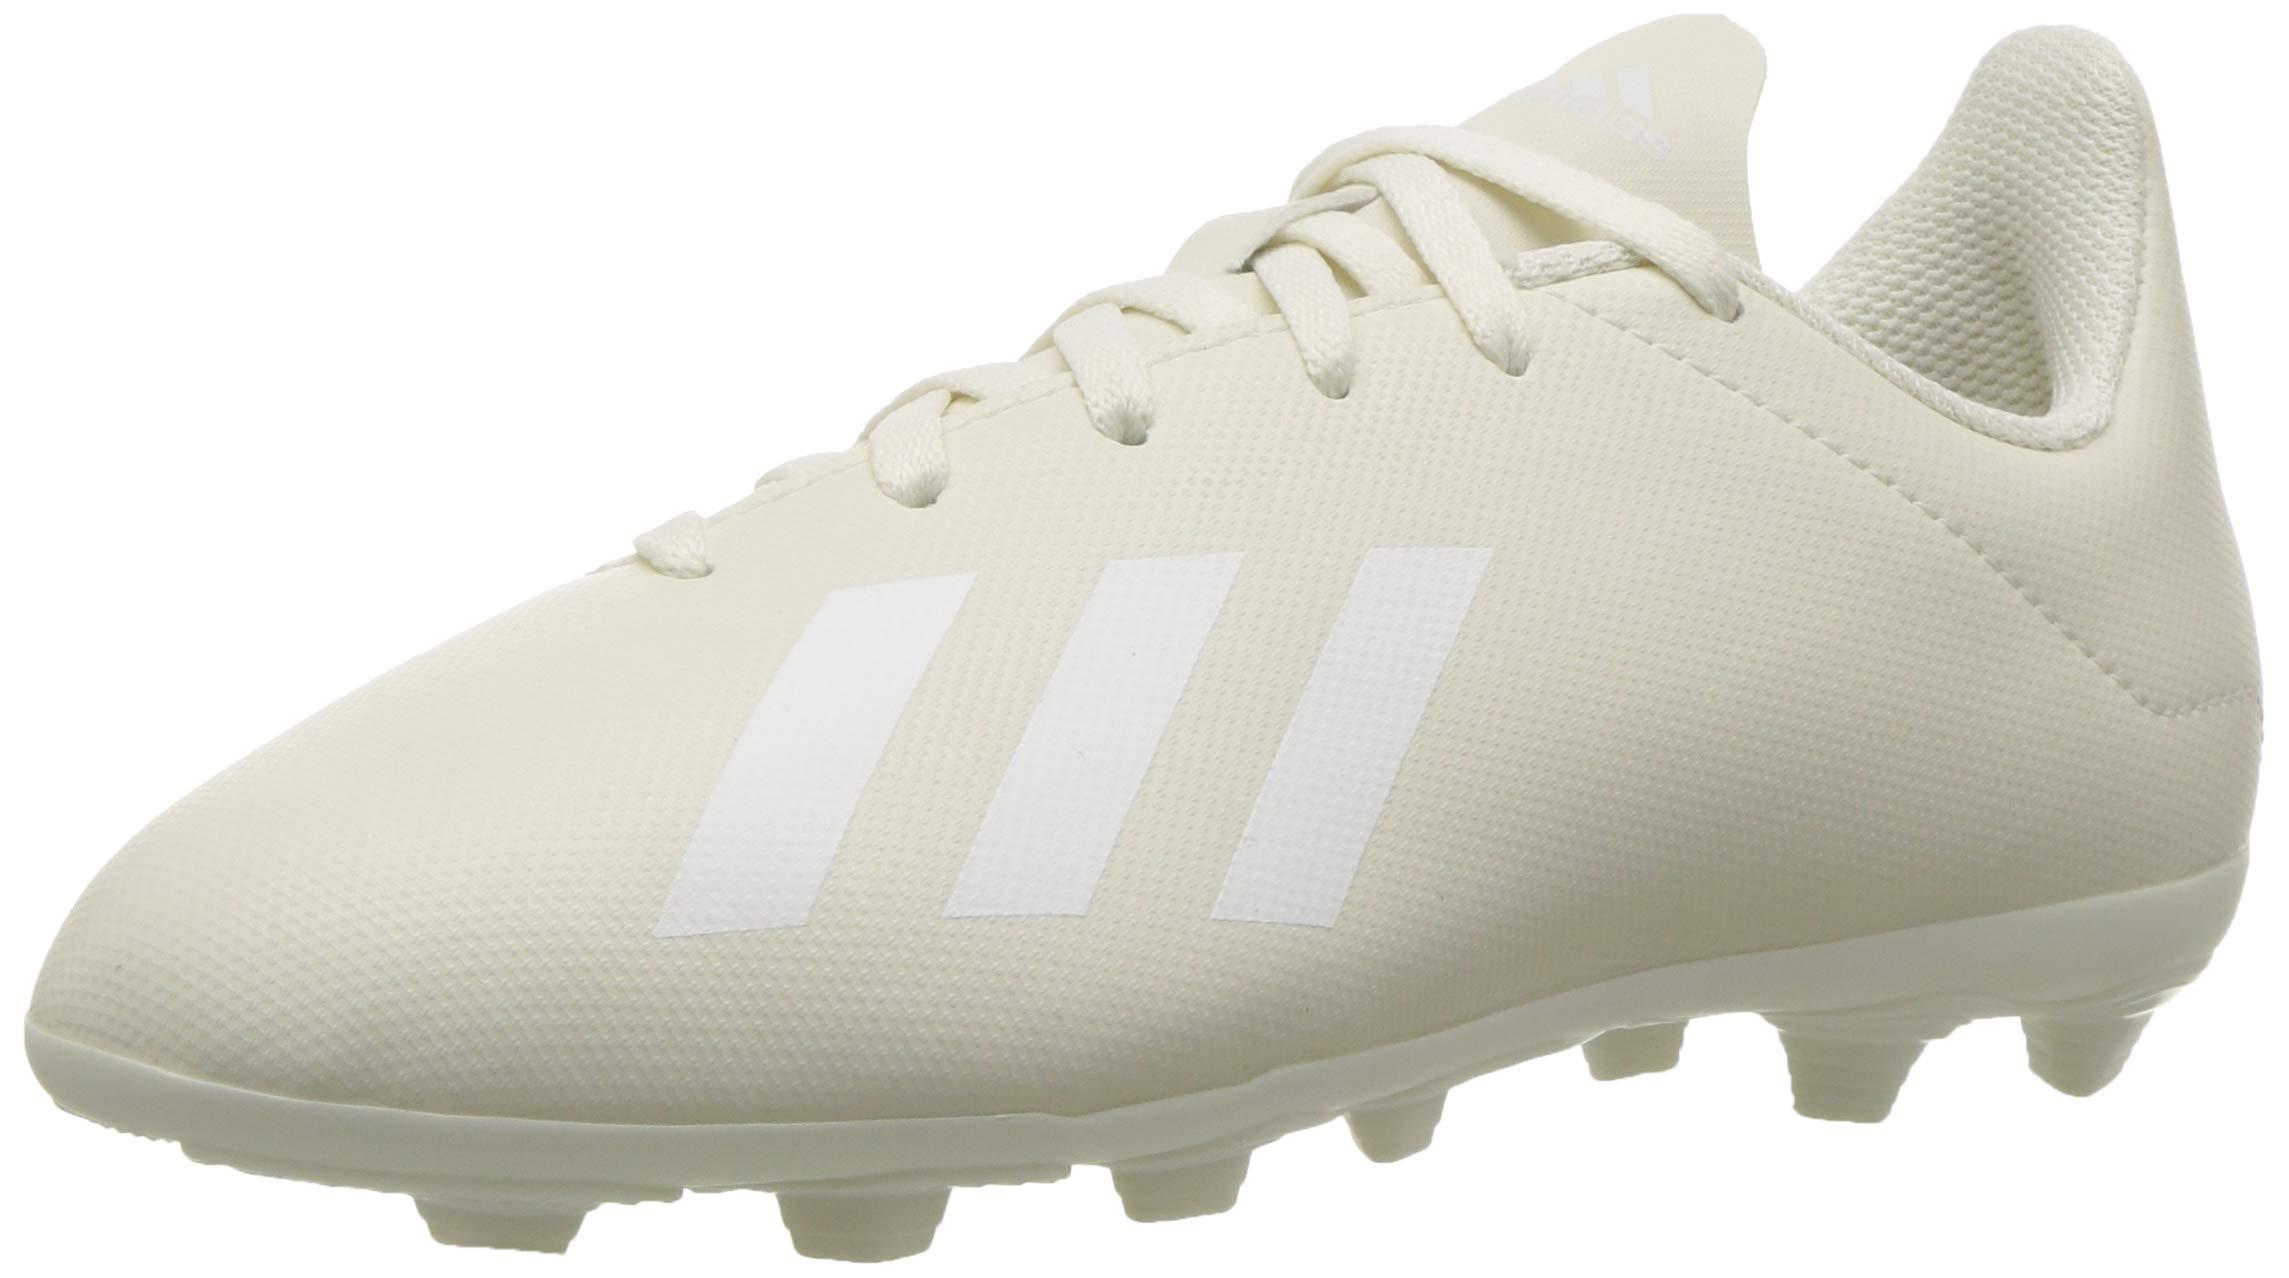 adidas Unisex X 18.4 Firm Ground Soccer Shoe, White/Gold Metallic, 2 M US Little Kid